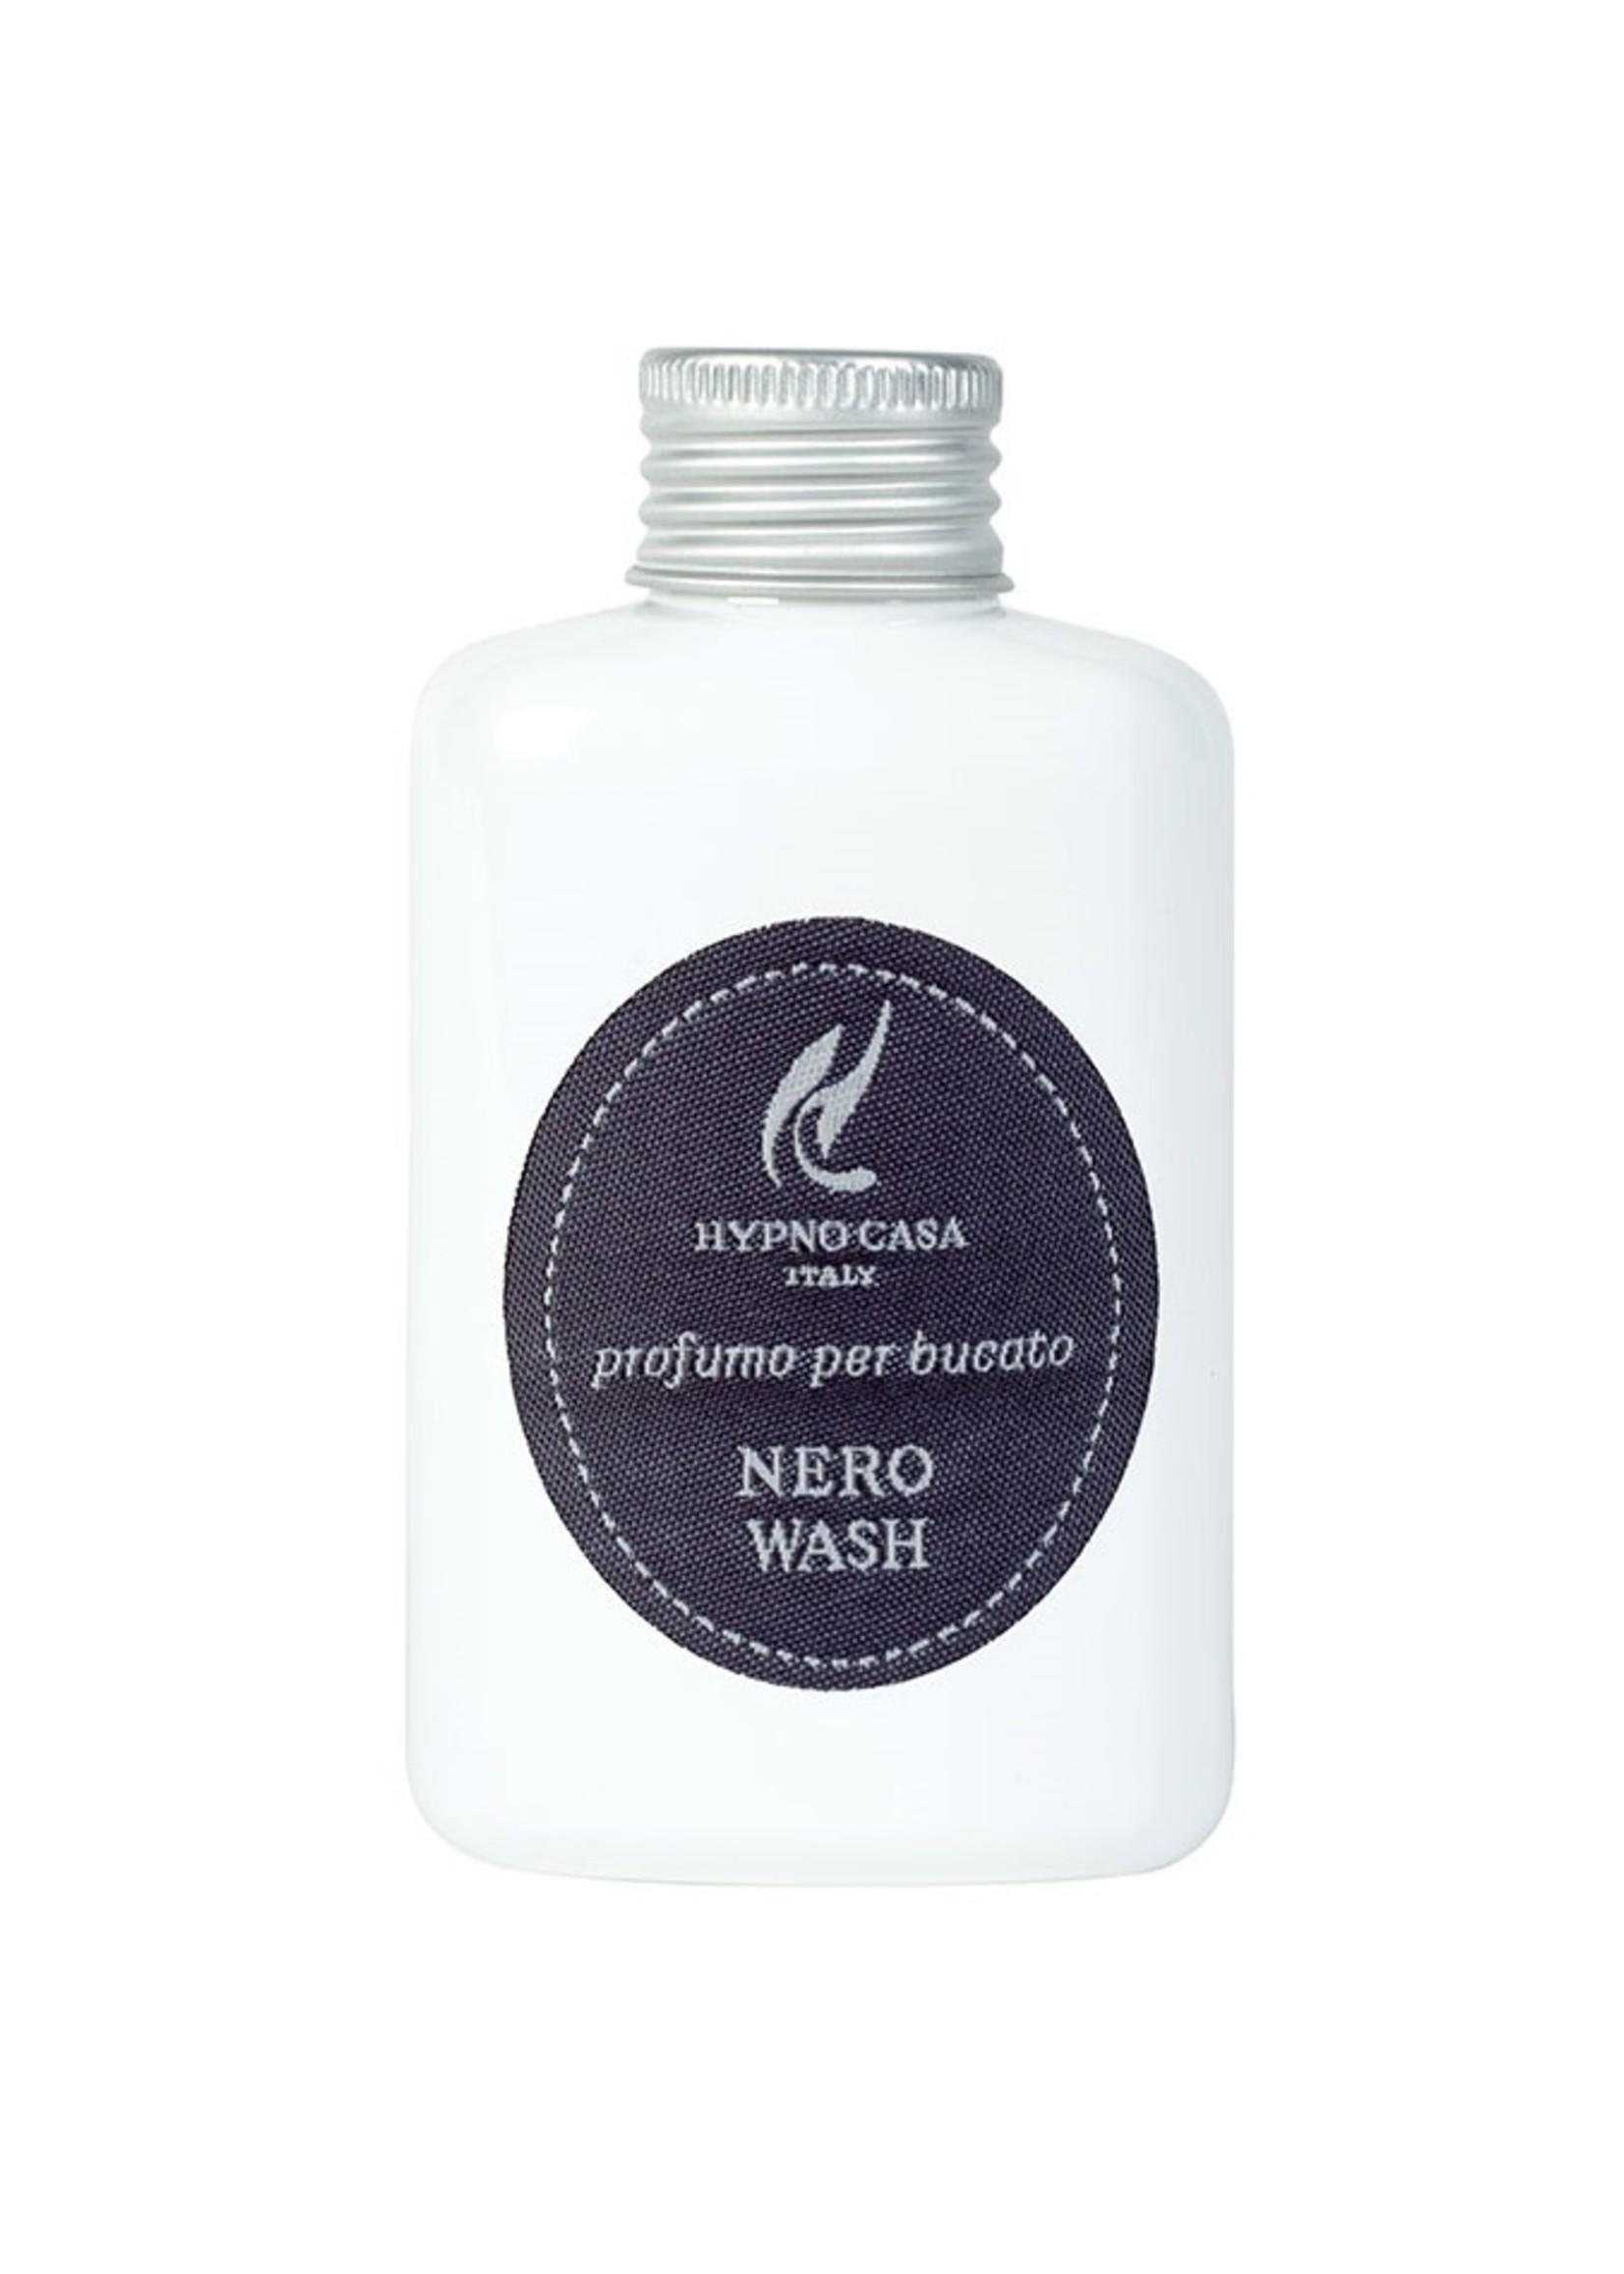 Hypno Casa Wasparfum Nero Wash